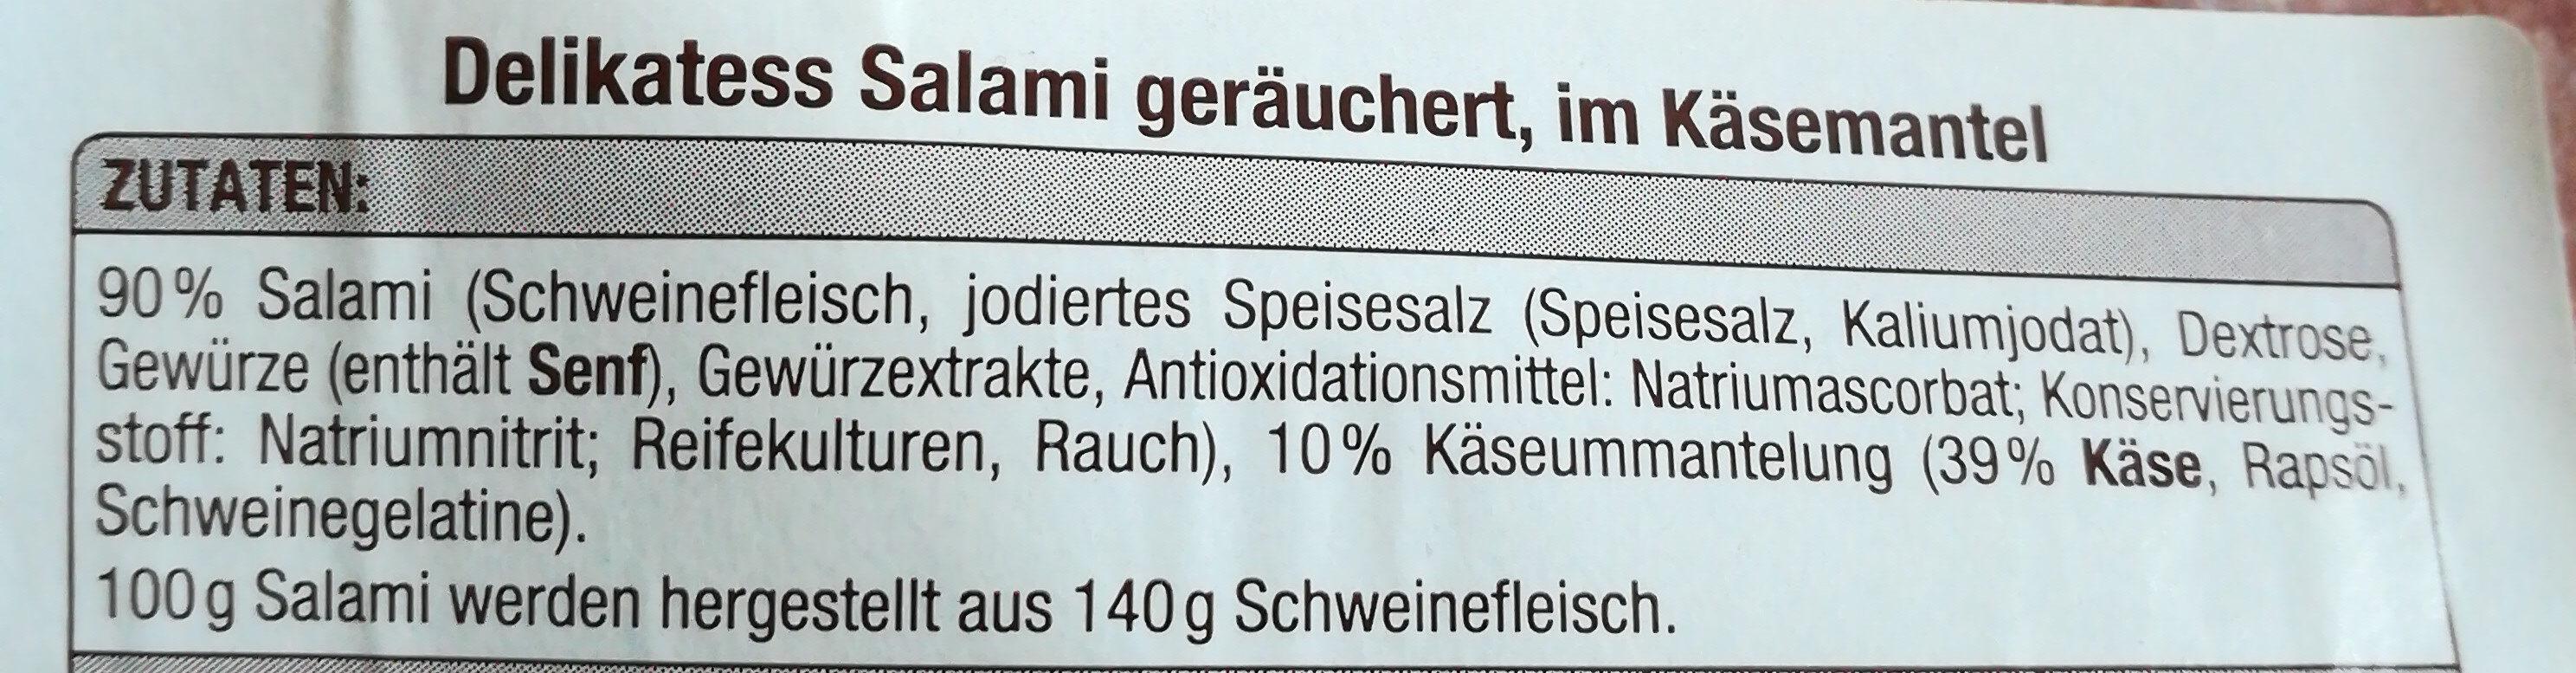 Delikatess Salami geräuchert, im Käsemantel - Ingredients - de